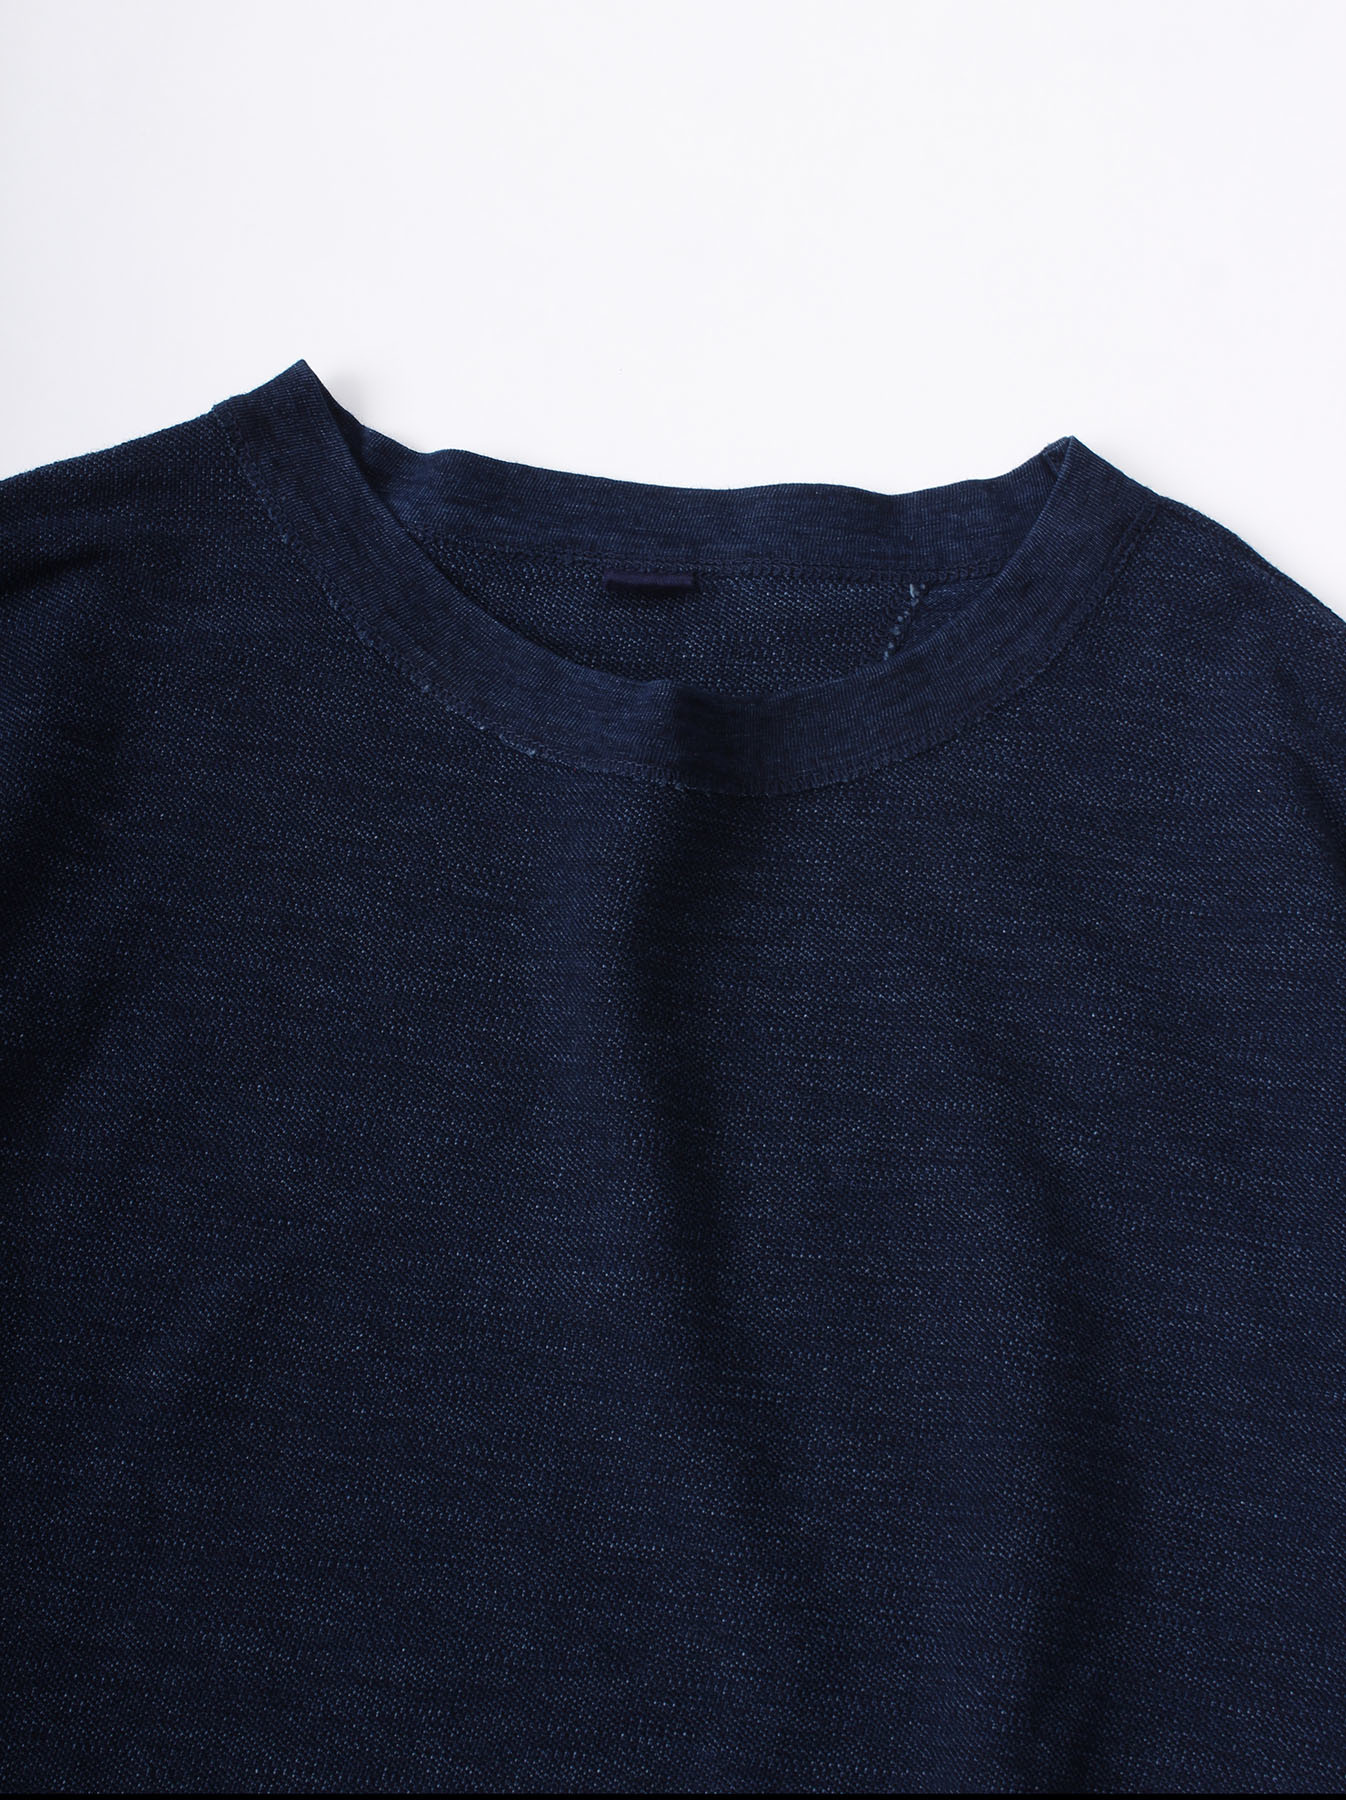 WH Indigo Ultimate Pique T-shirt-6